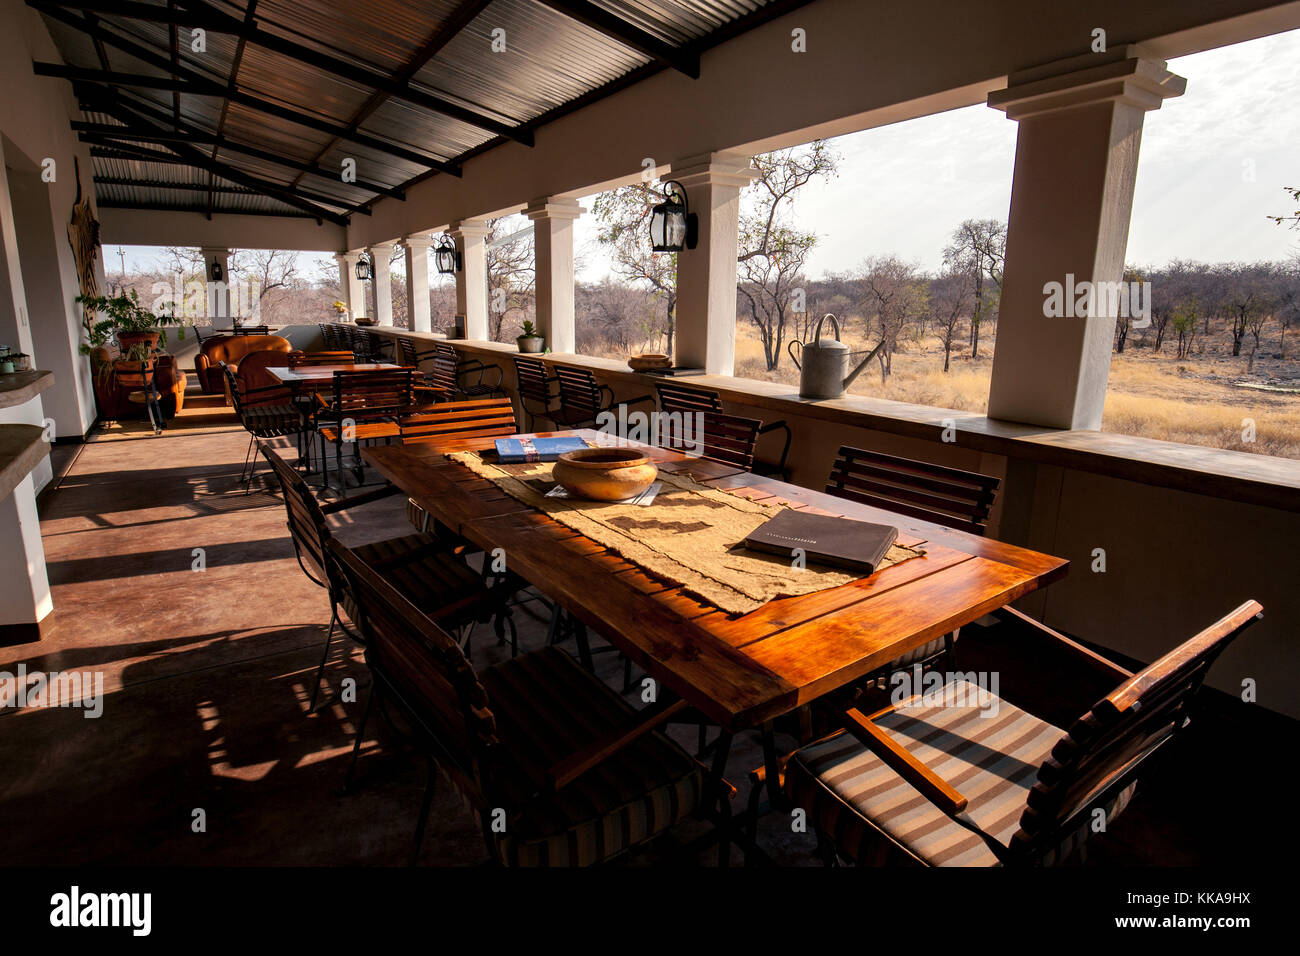 Zona de restaurante en el camping de lujo onguma tamboti, reserva de caza, Namibia, África Imagen De Stock